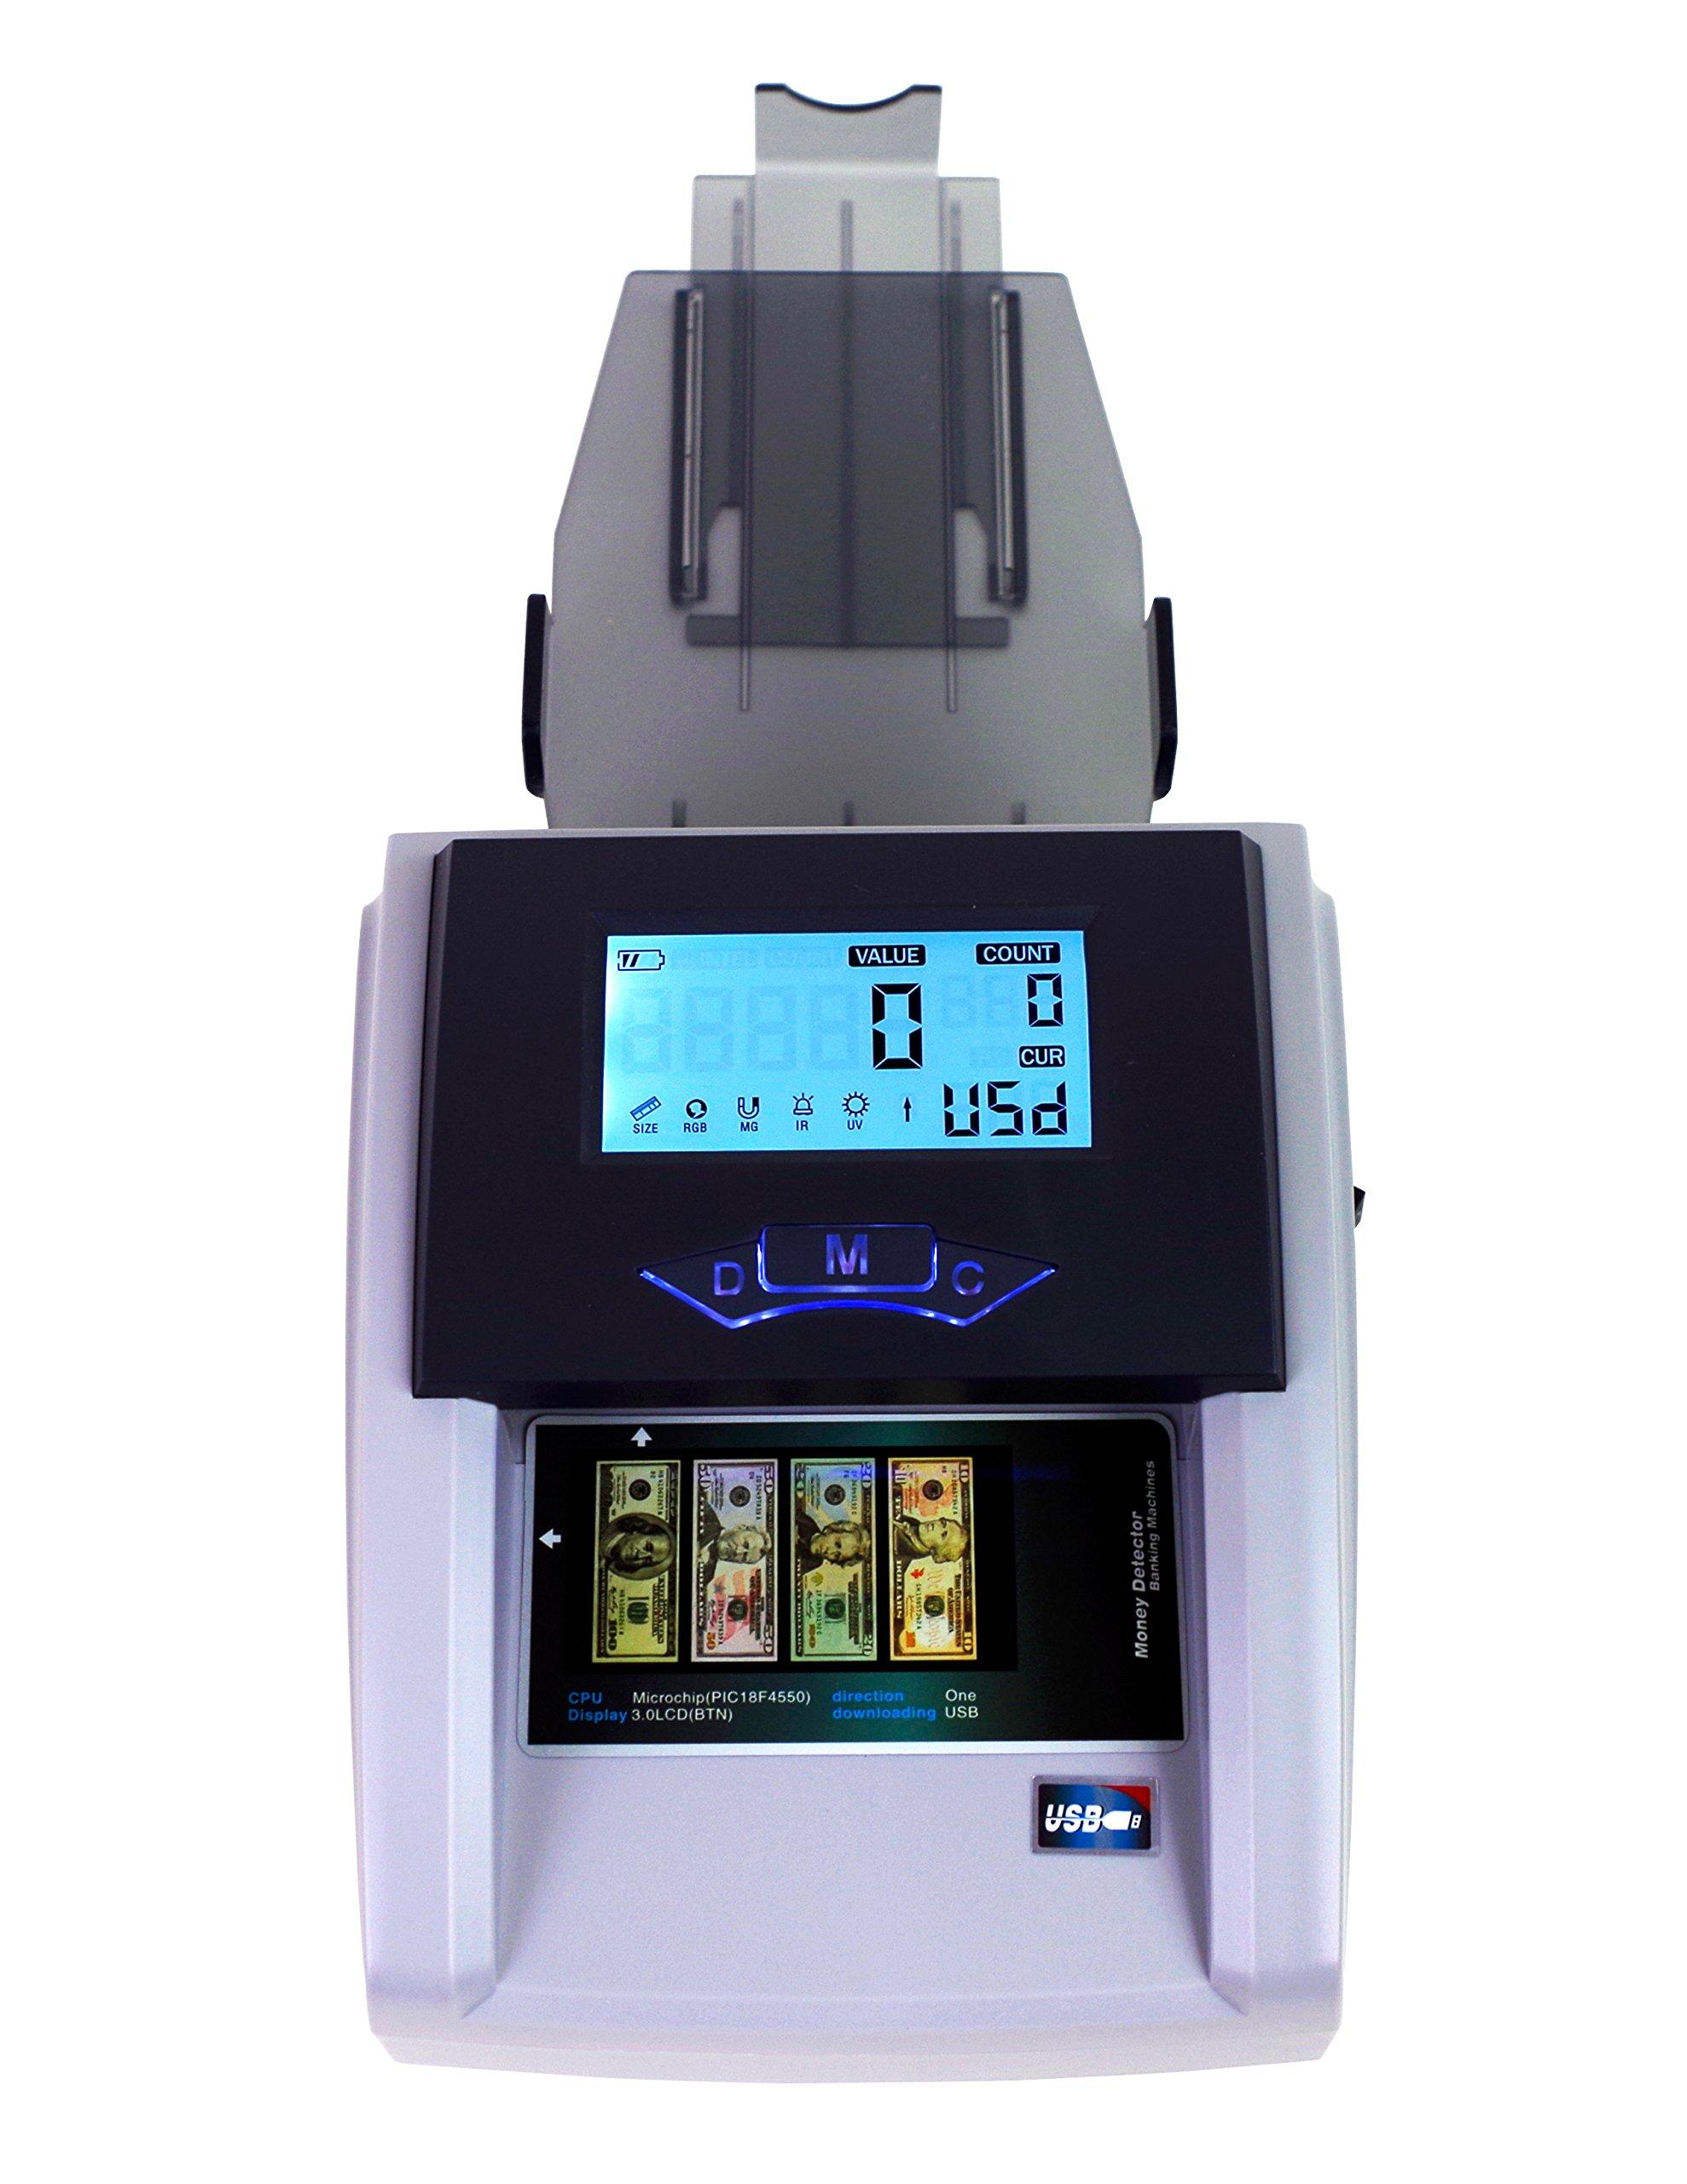 Money Detector Counterfeit Bill Counter Banknote Denomination Cash Reader UV MG Fake Bill LCD Screen By Spreezie